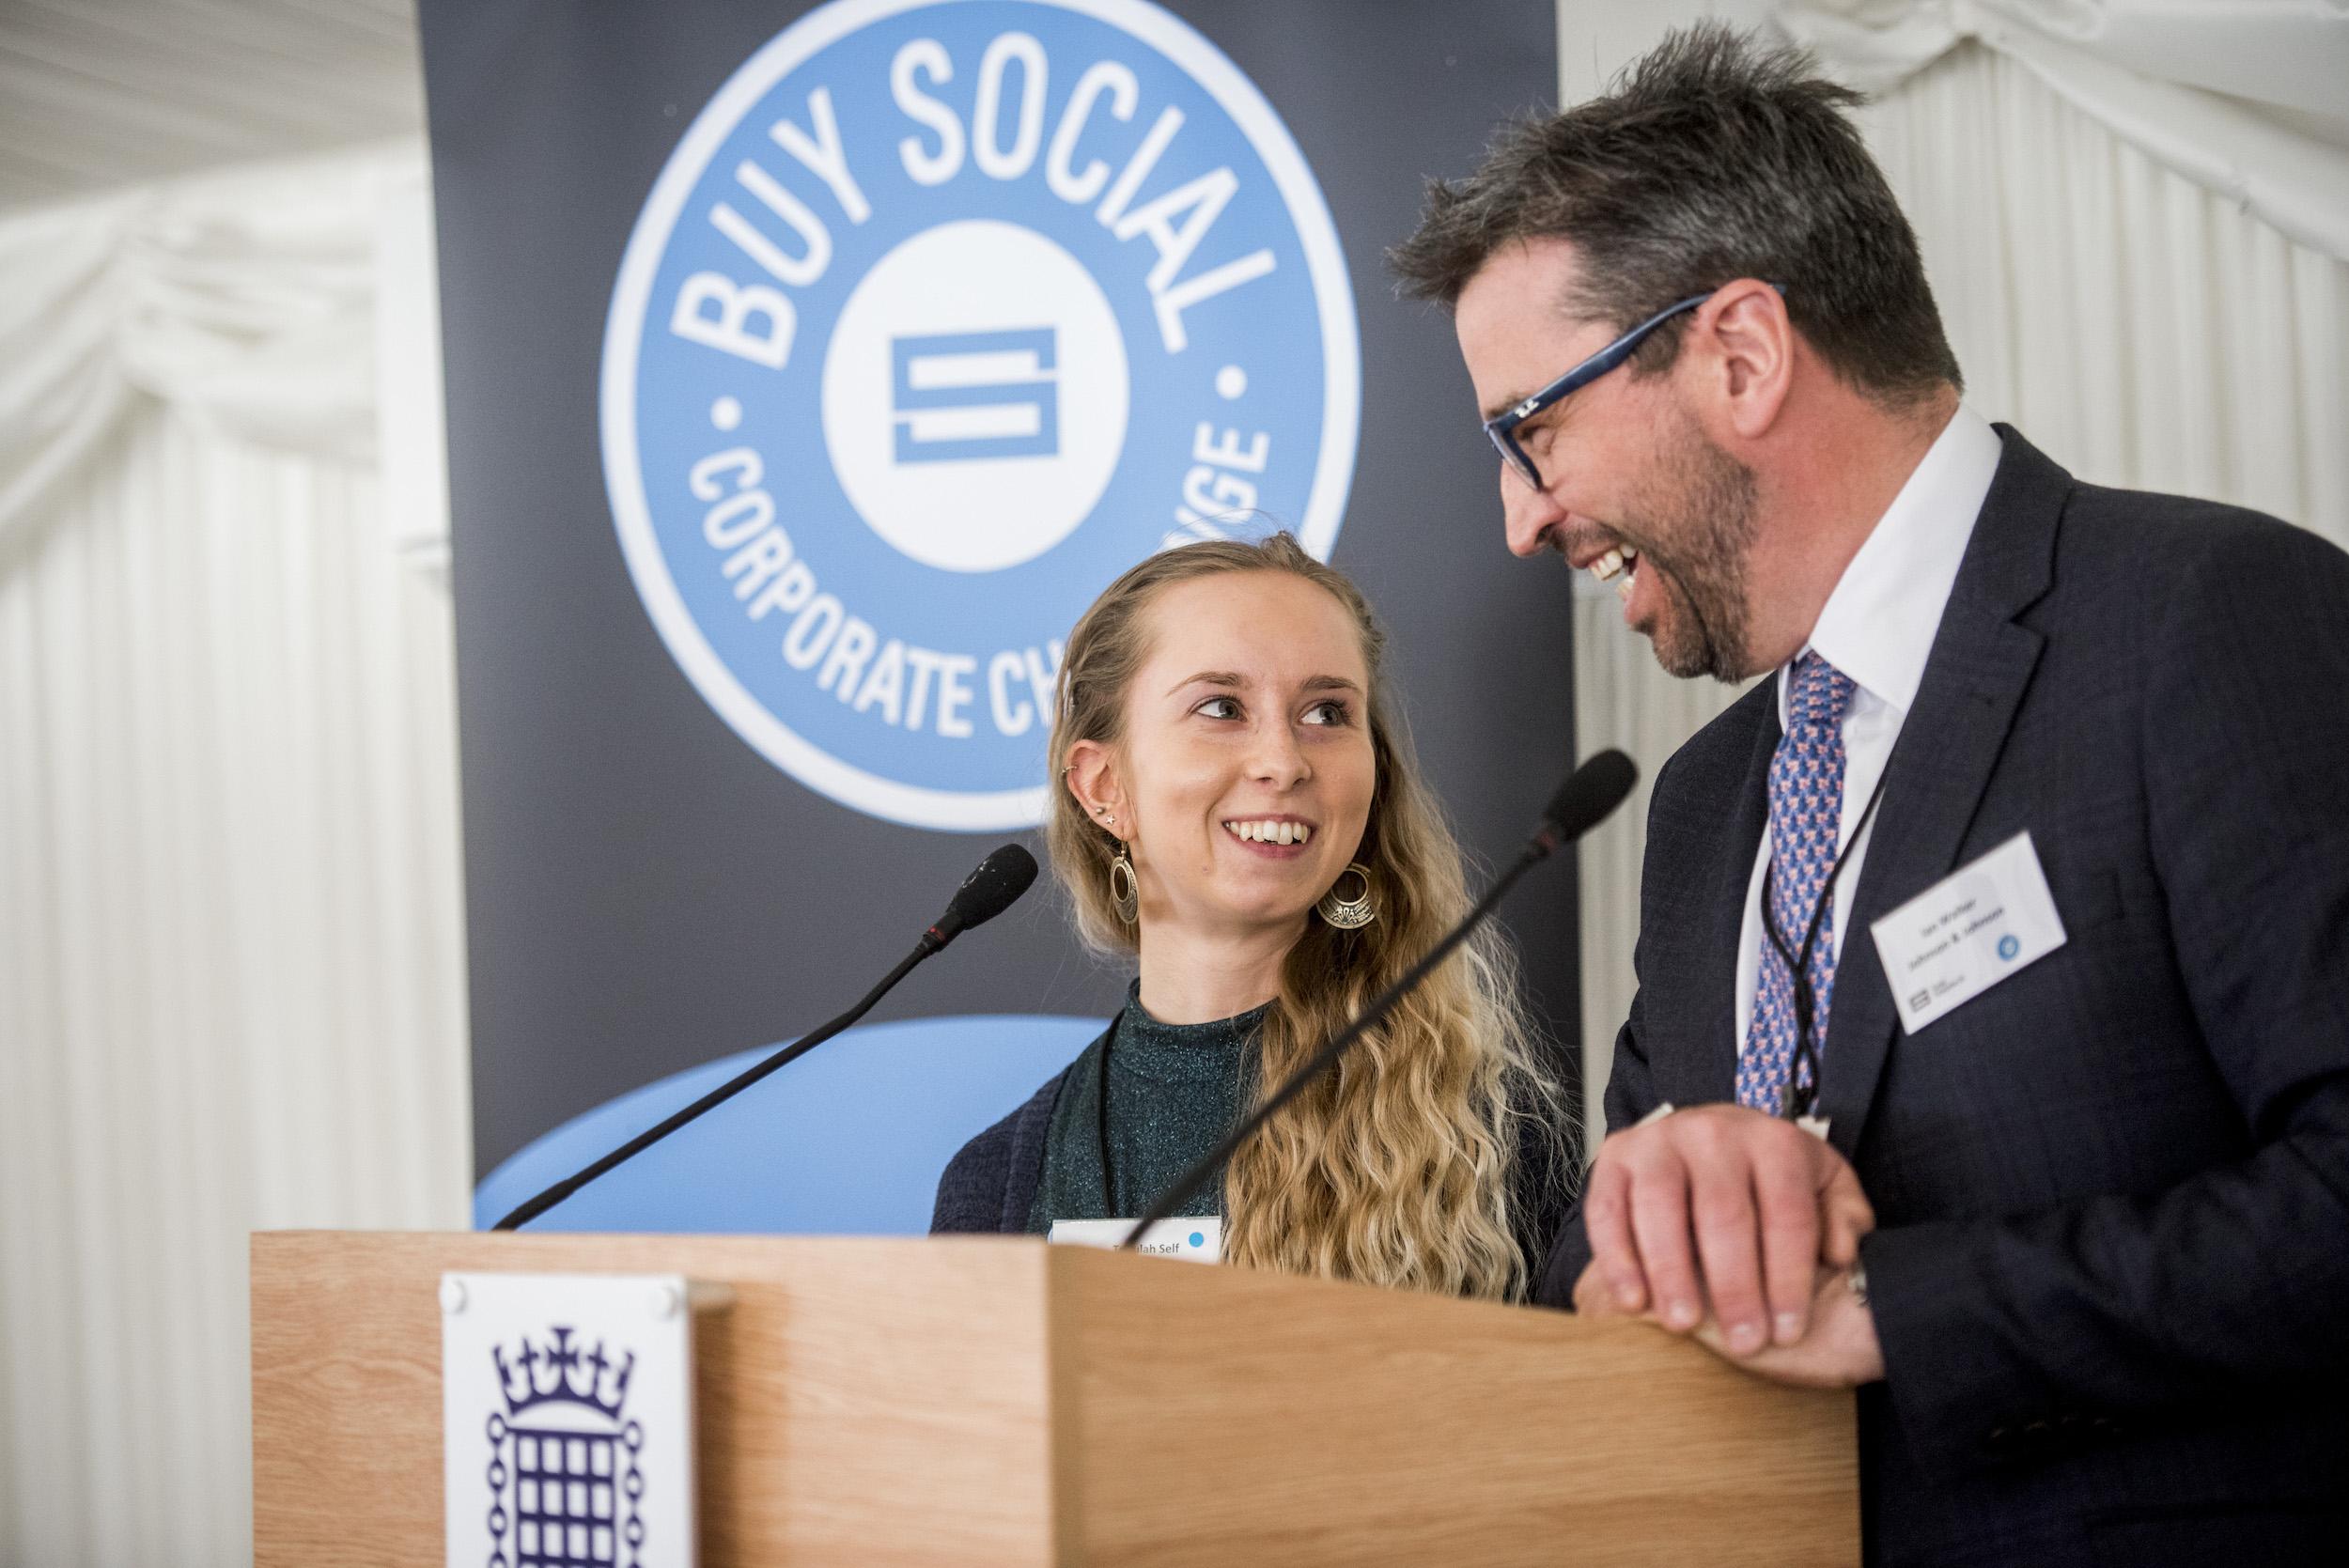 SEUK Buy Social launch 2019